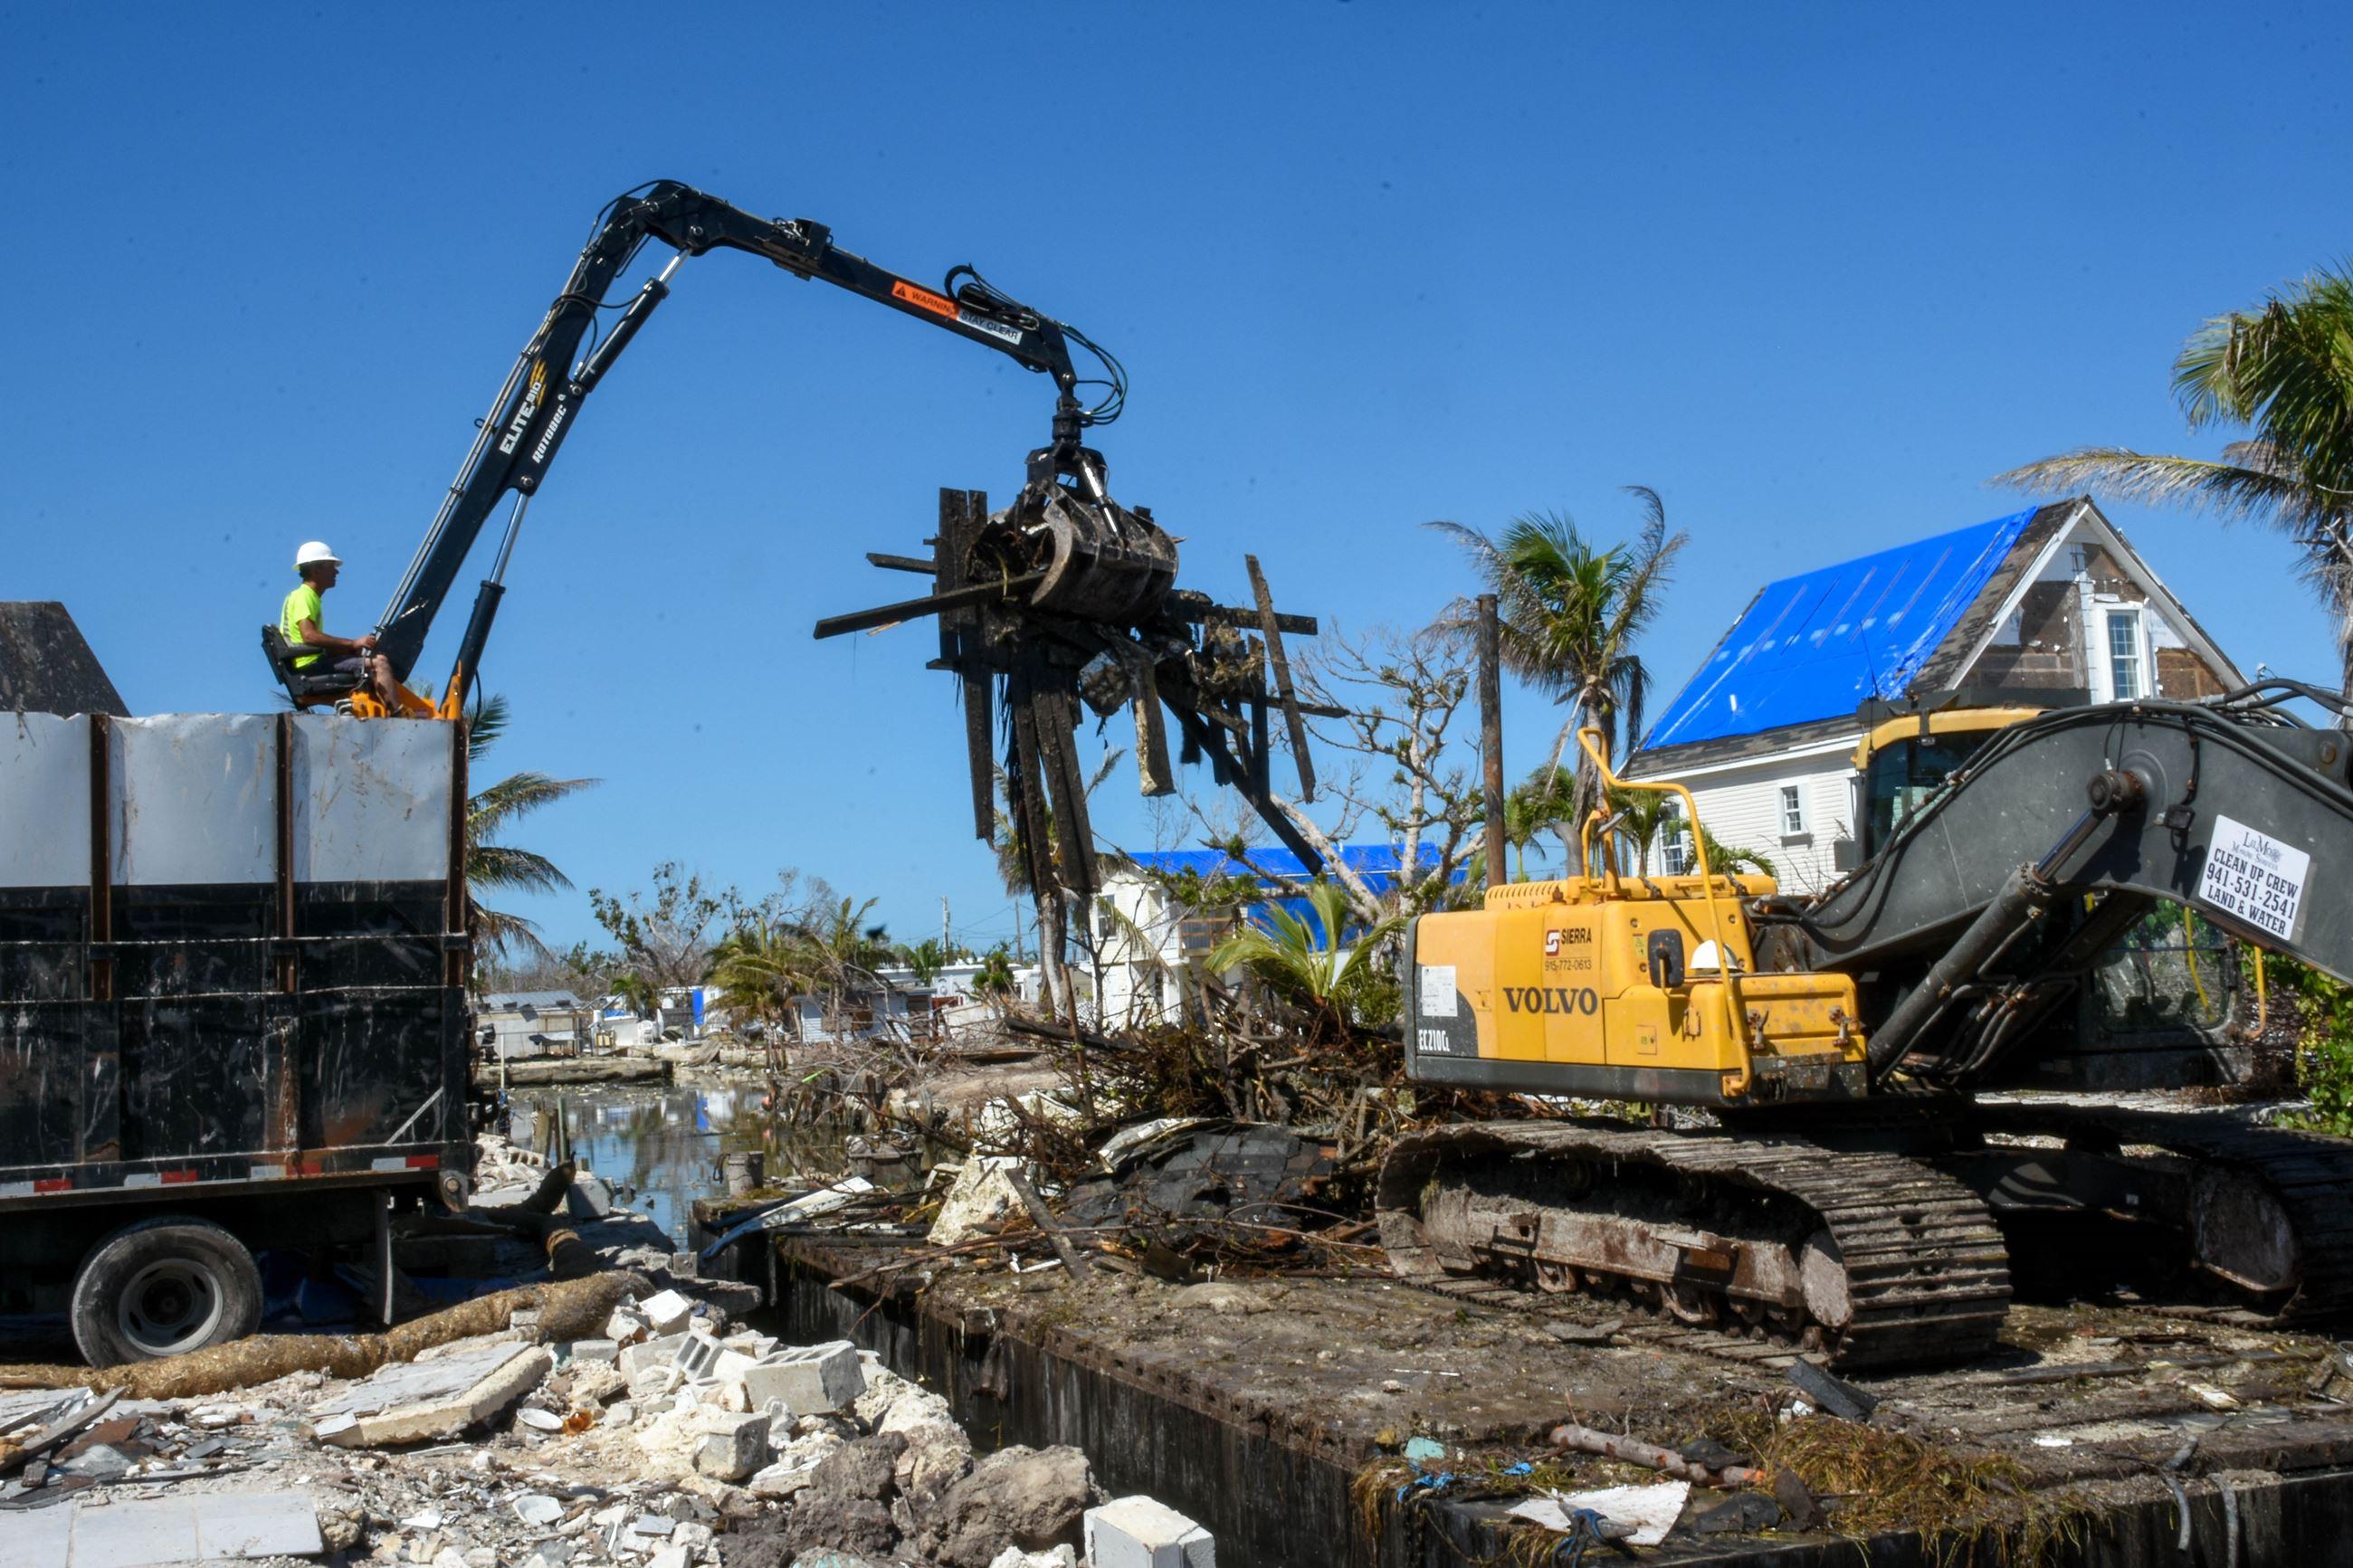 Marine Hurricane Debris Cleanup | Monroe County, FL - Official Website